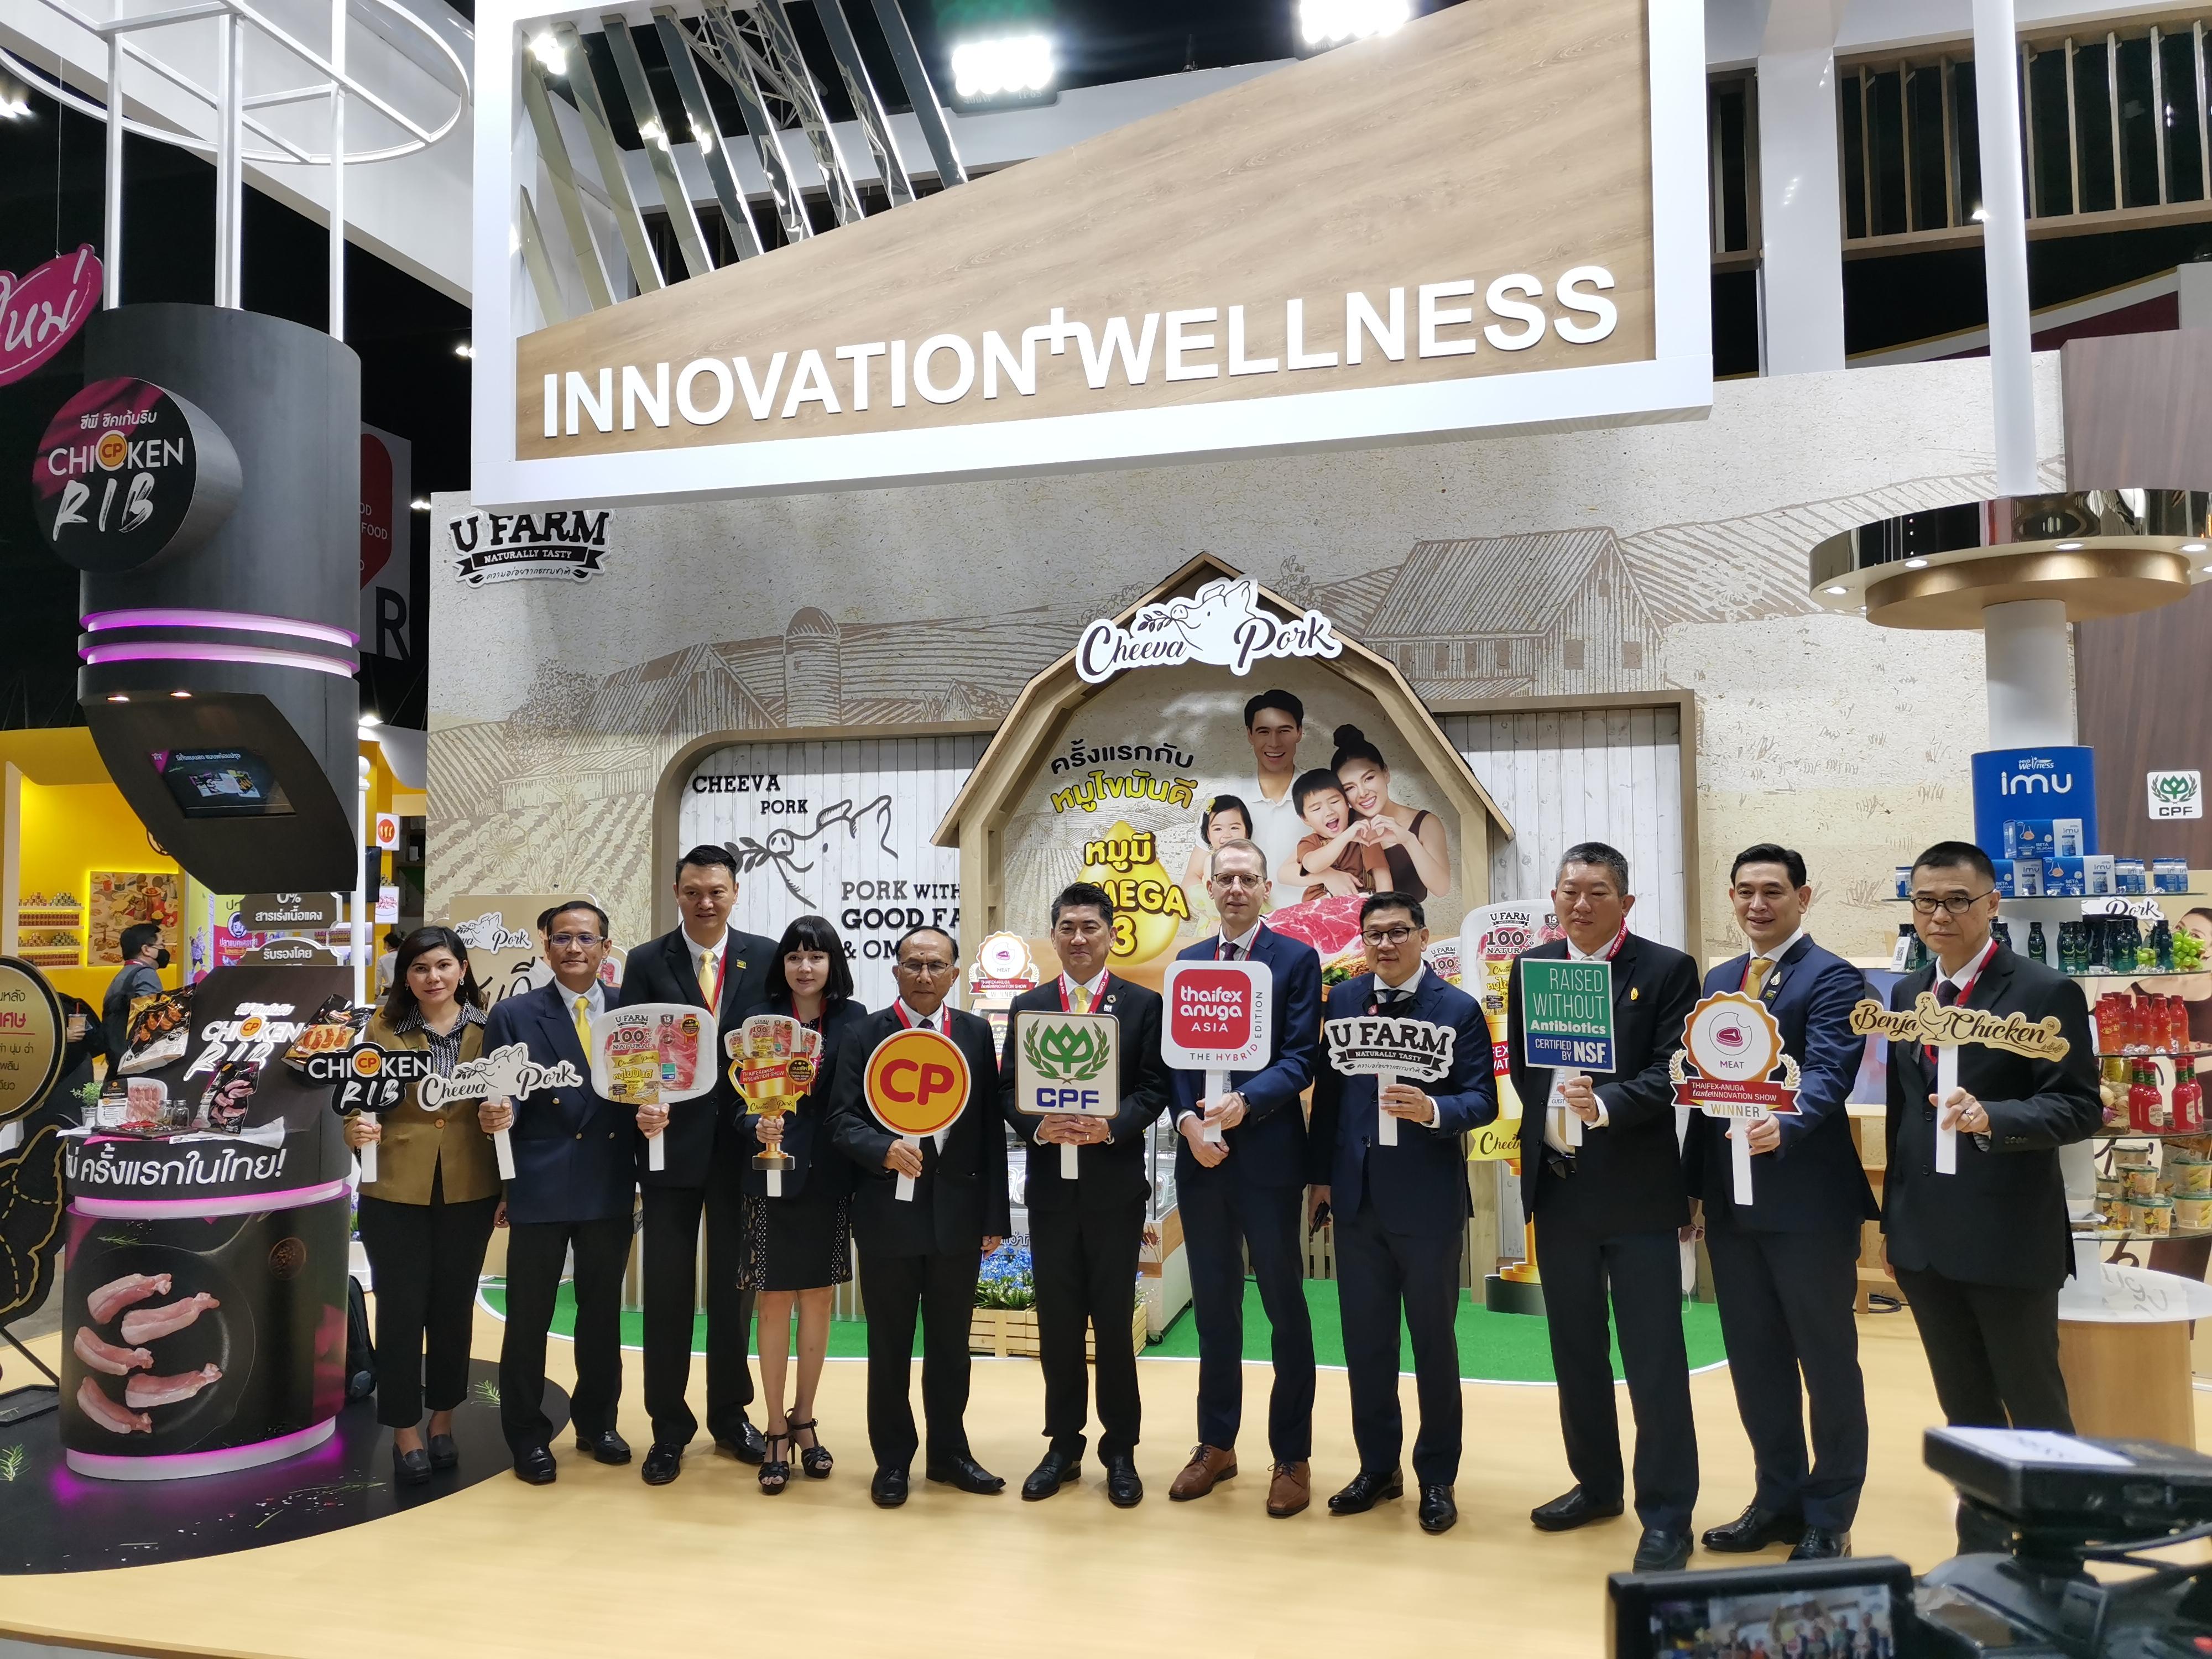 "CPF ชูแนวคิด FOOD FOR TOMORROW ในงาน Thaifex 2020 ตอบโจทย์ยุค New Normal ปลื้ม ""หมูชีวา"" คว้ารางวัลสุดยอดนวัตกรรม ตอกย้ำครัวโลกยั่งยืน สำนักพิมพ์แม่บ้าน"